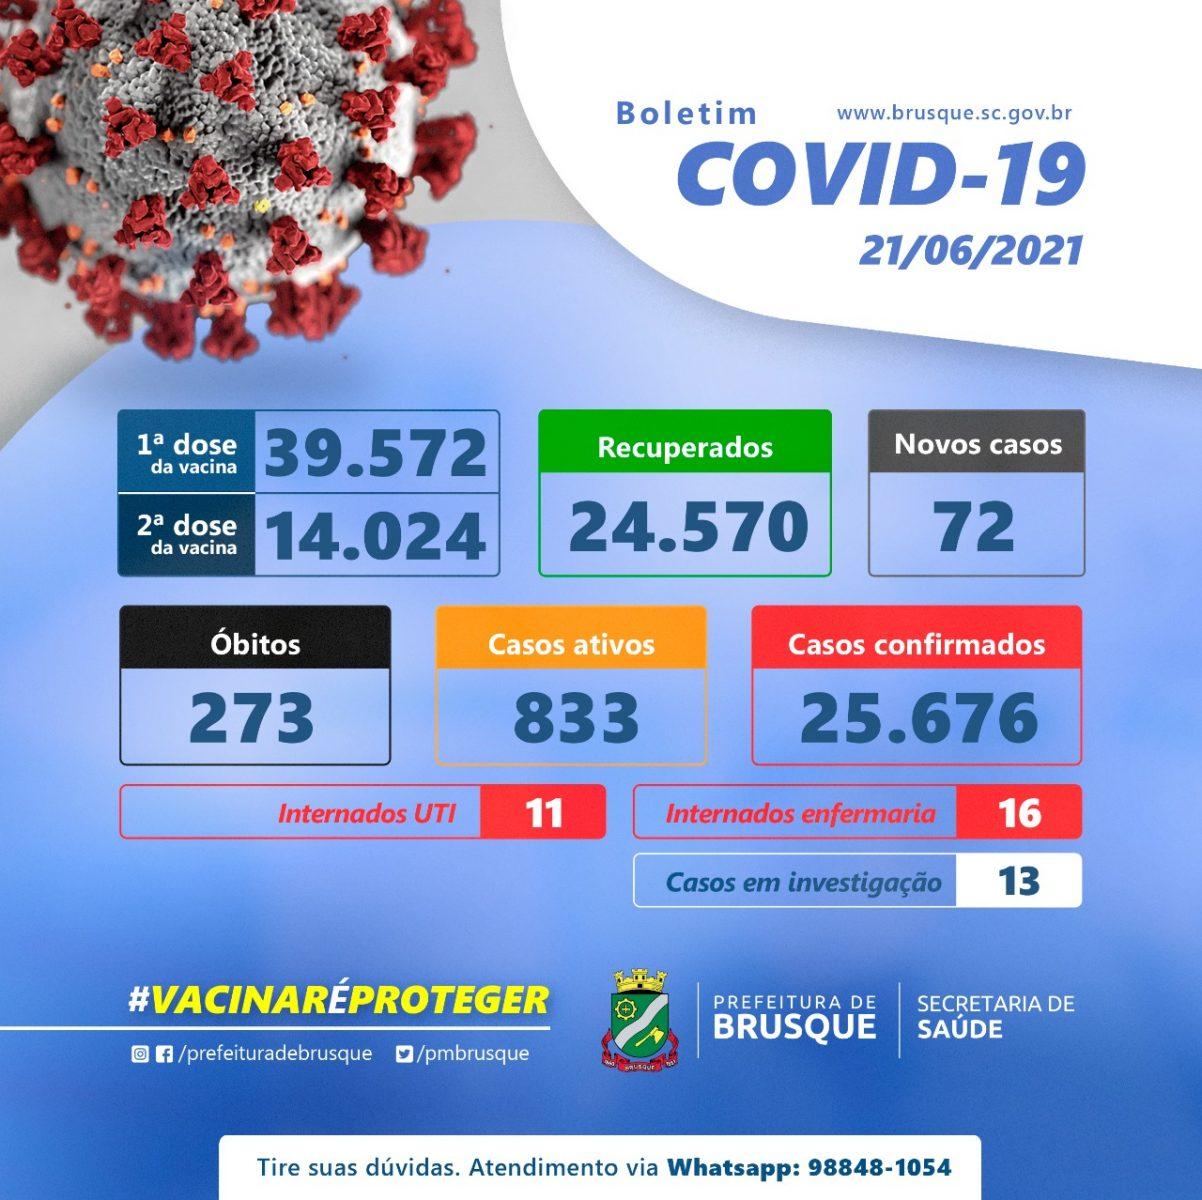 Covid 19: Confira o boletim epidemiológico desta segunda-feira (21)